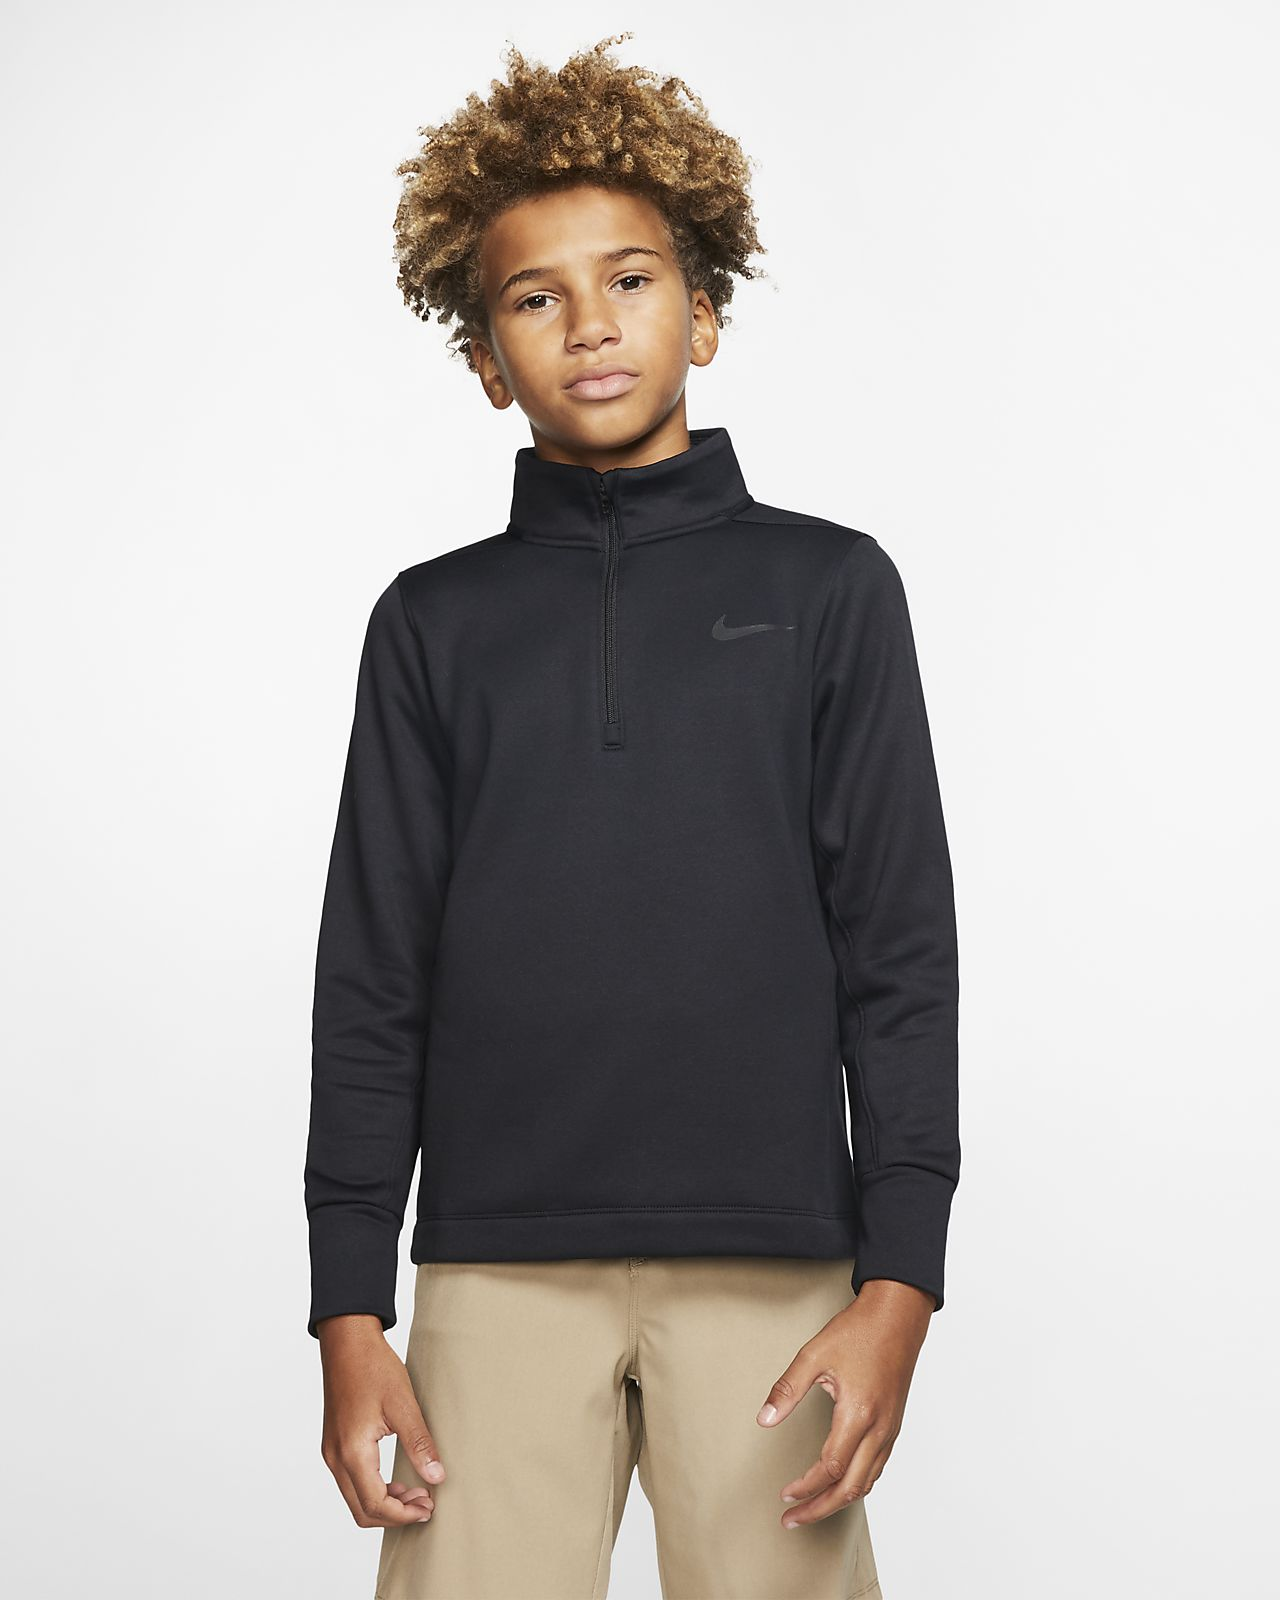 Nike Dri-FIT Therma Older Kids' (Boys') Half-Zip Golf Top